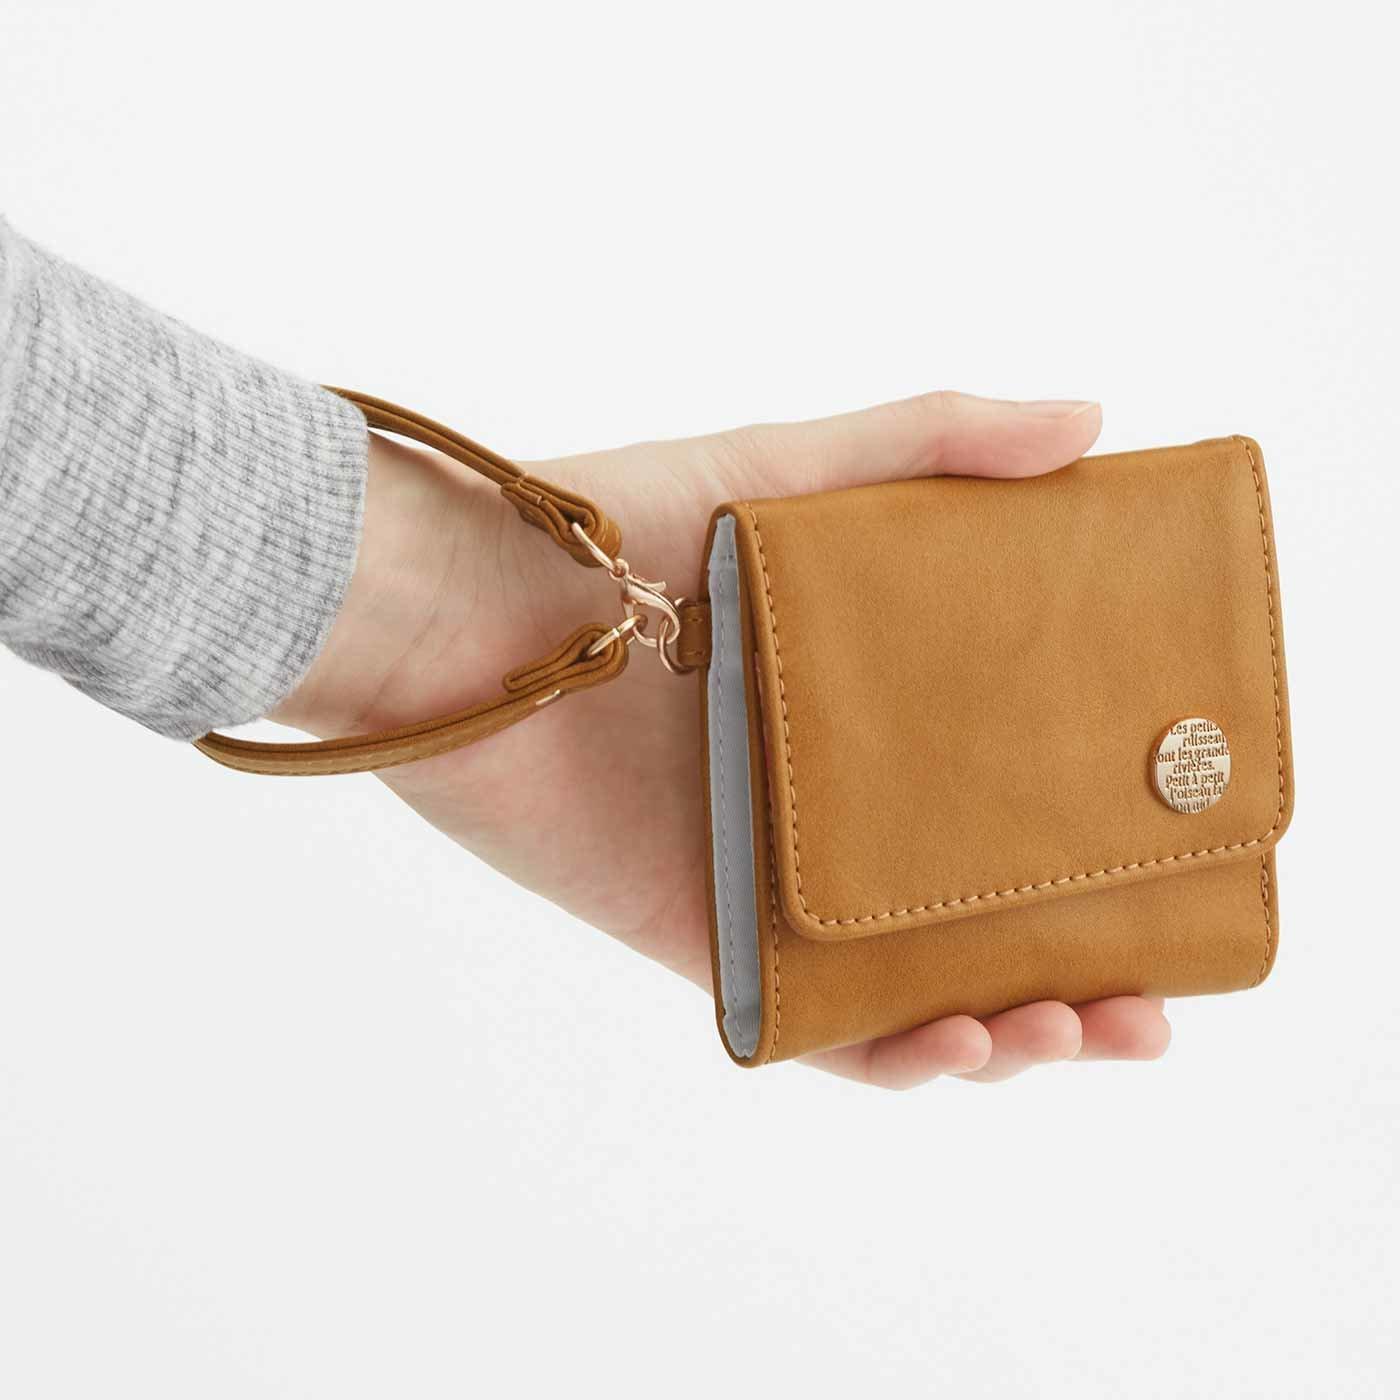 UP.de コンパクトが今の気分 大人かわいい手のり財布の会